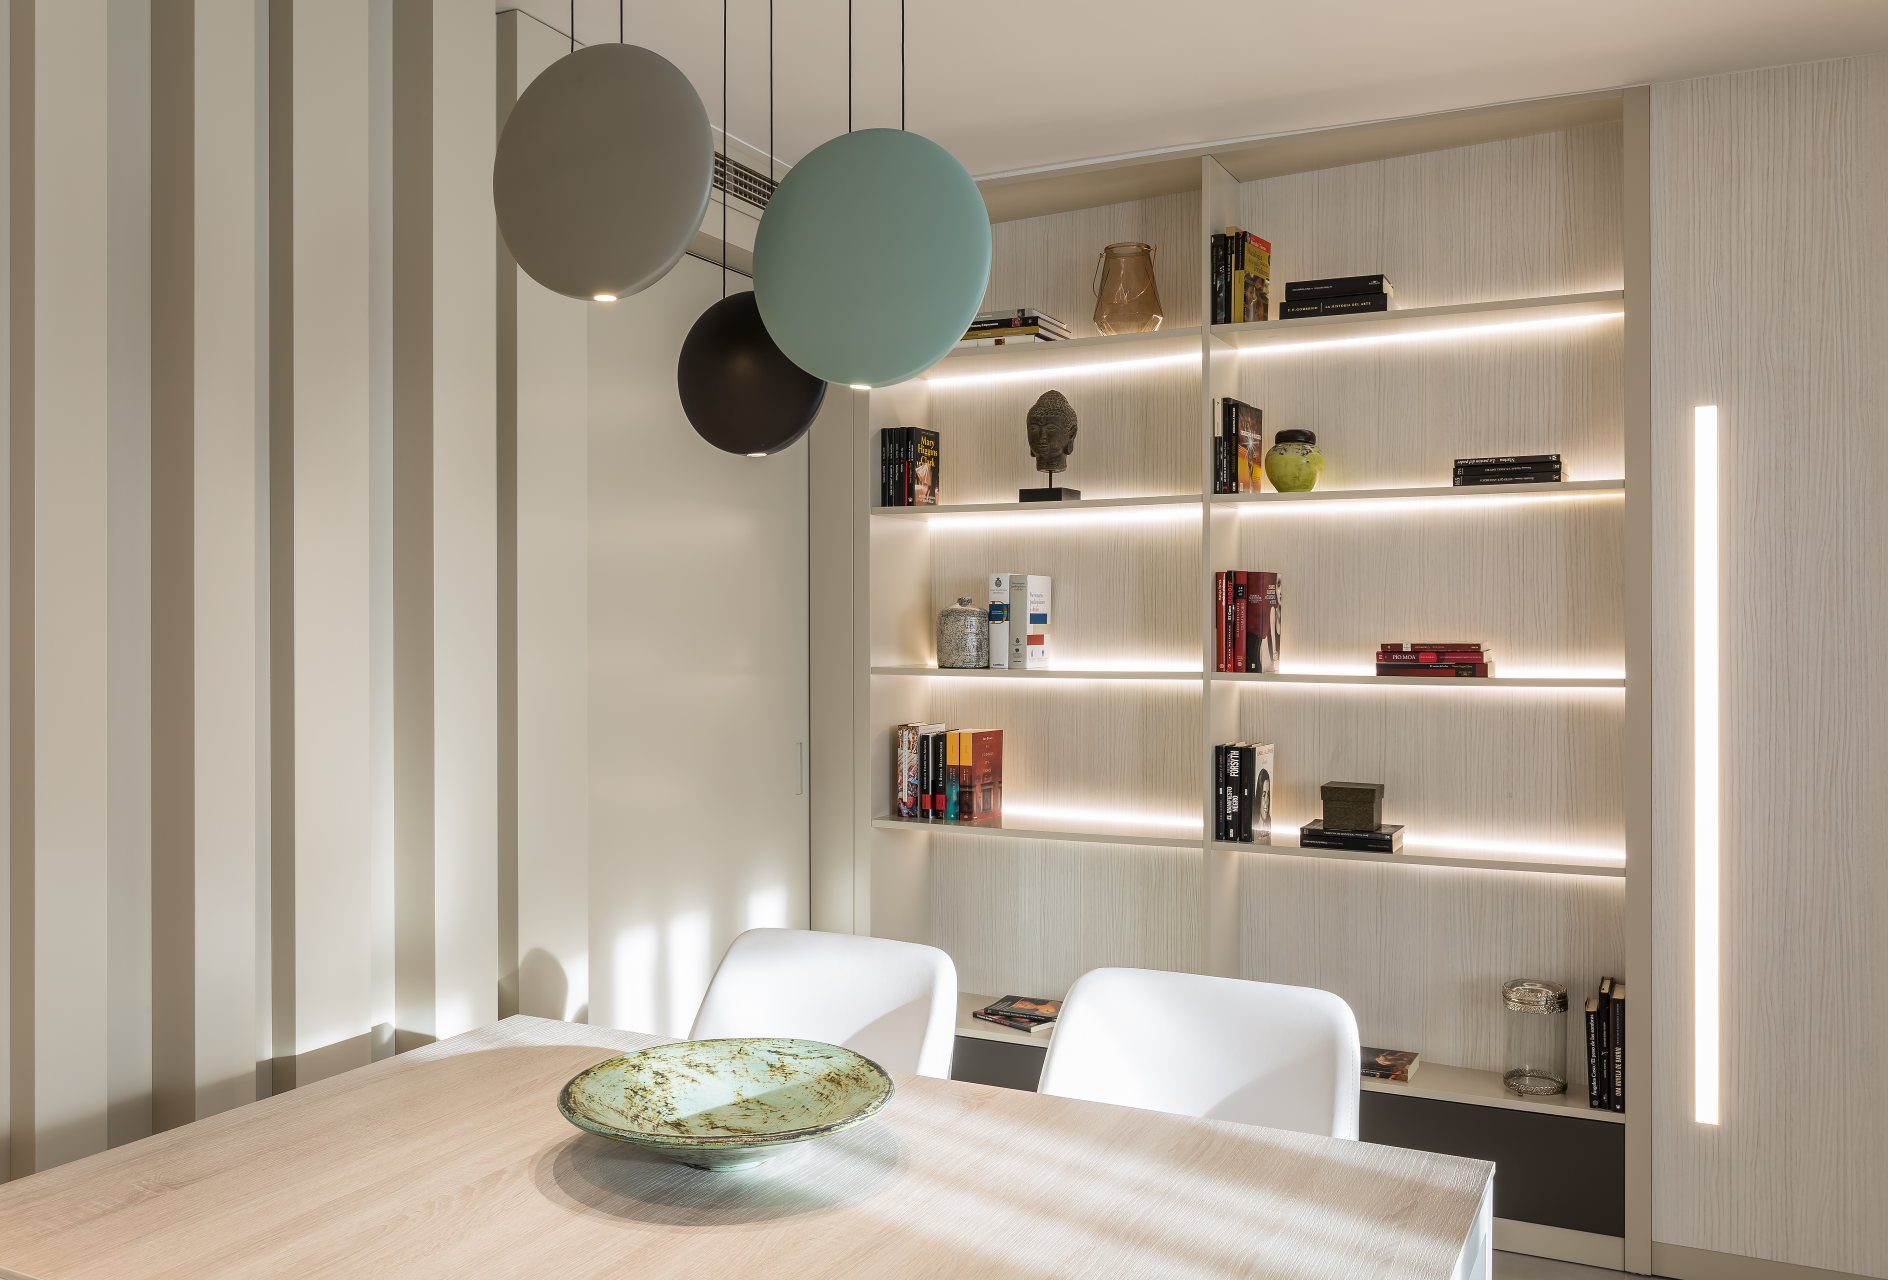 fotografia-arquitectura-interiorismo-valencia-fenollar-german-cabo-laura-yerpes  (6)